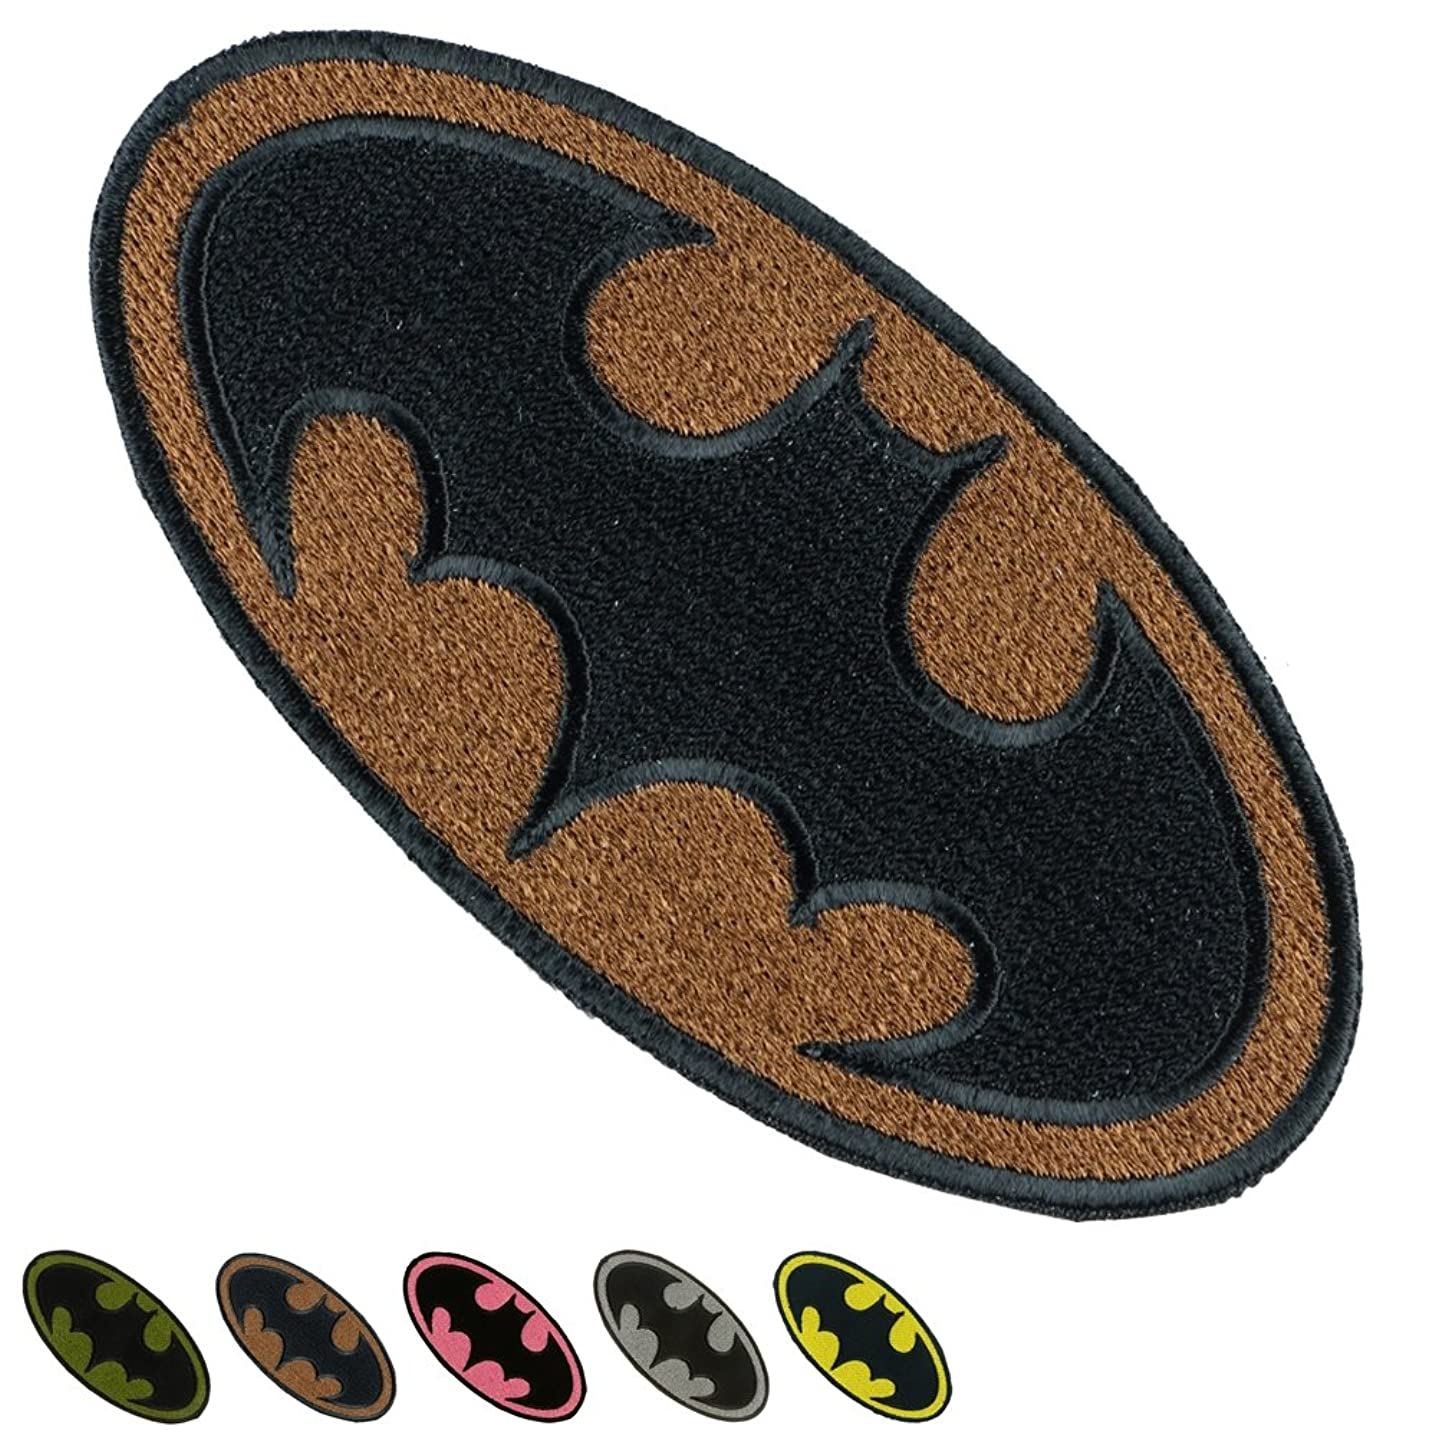 Iron Sew on Applique Patch : BATMAN Super Hero (Brown)